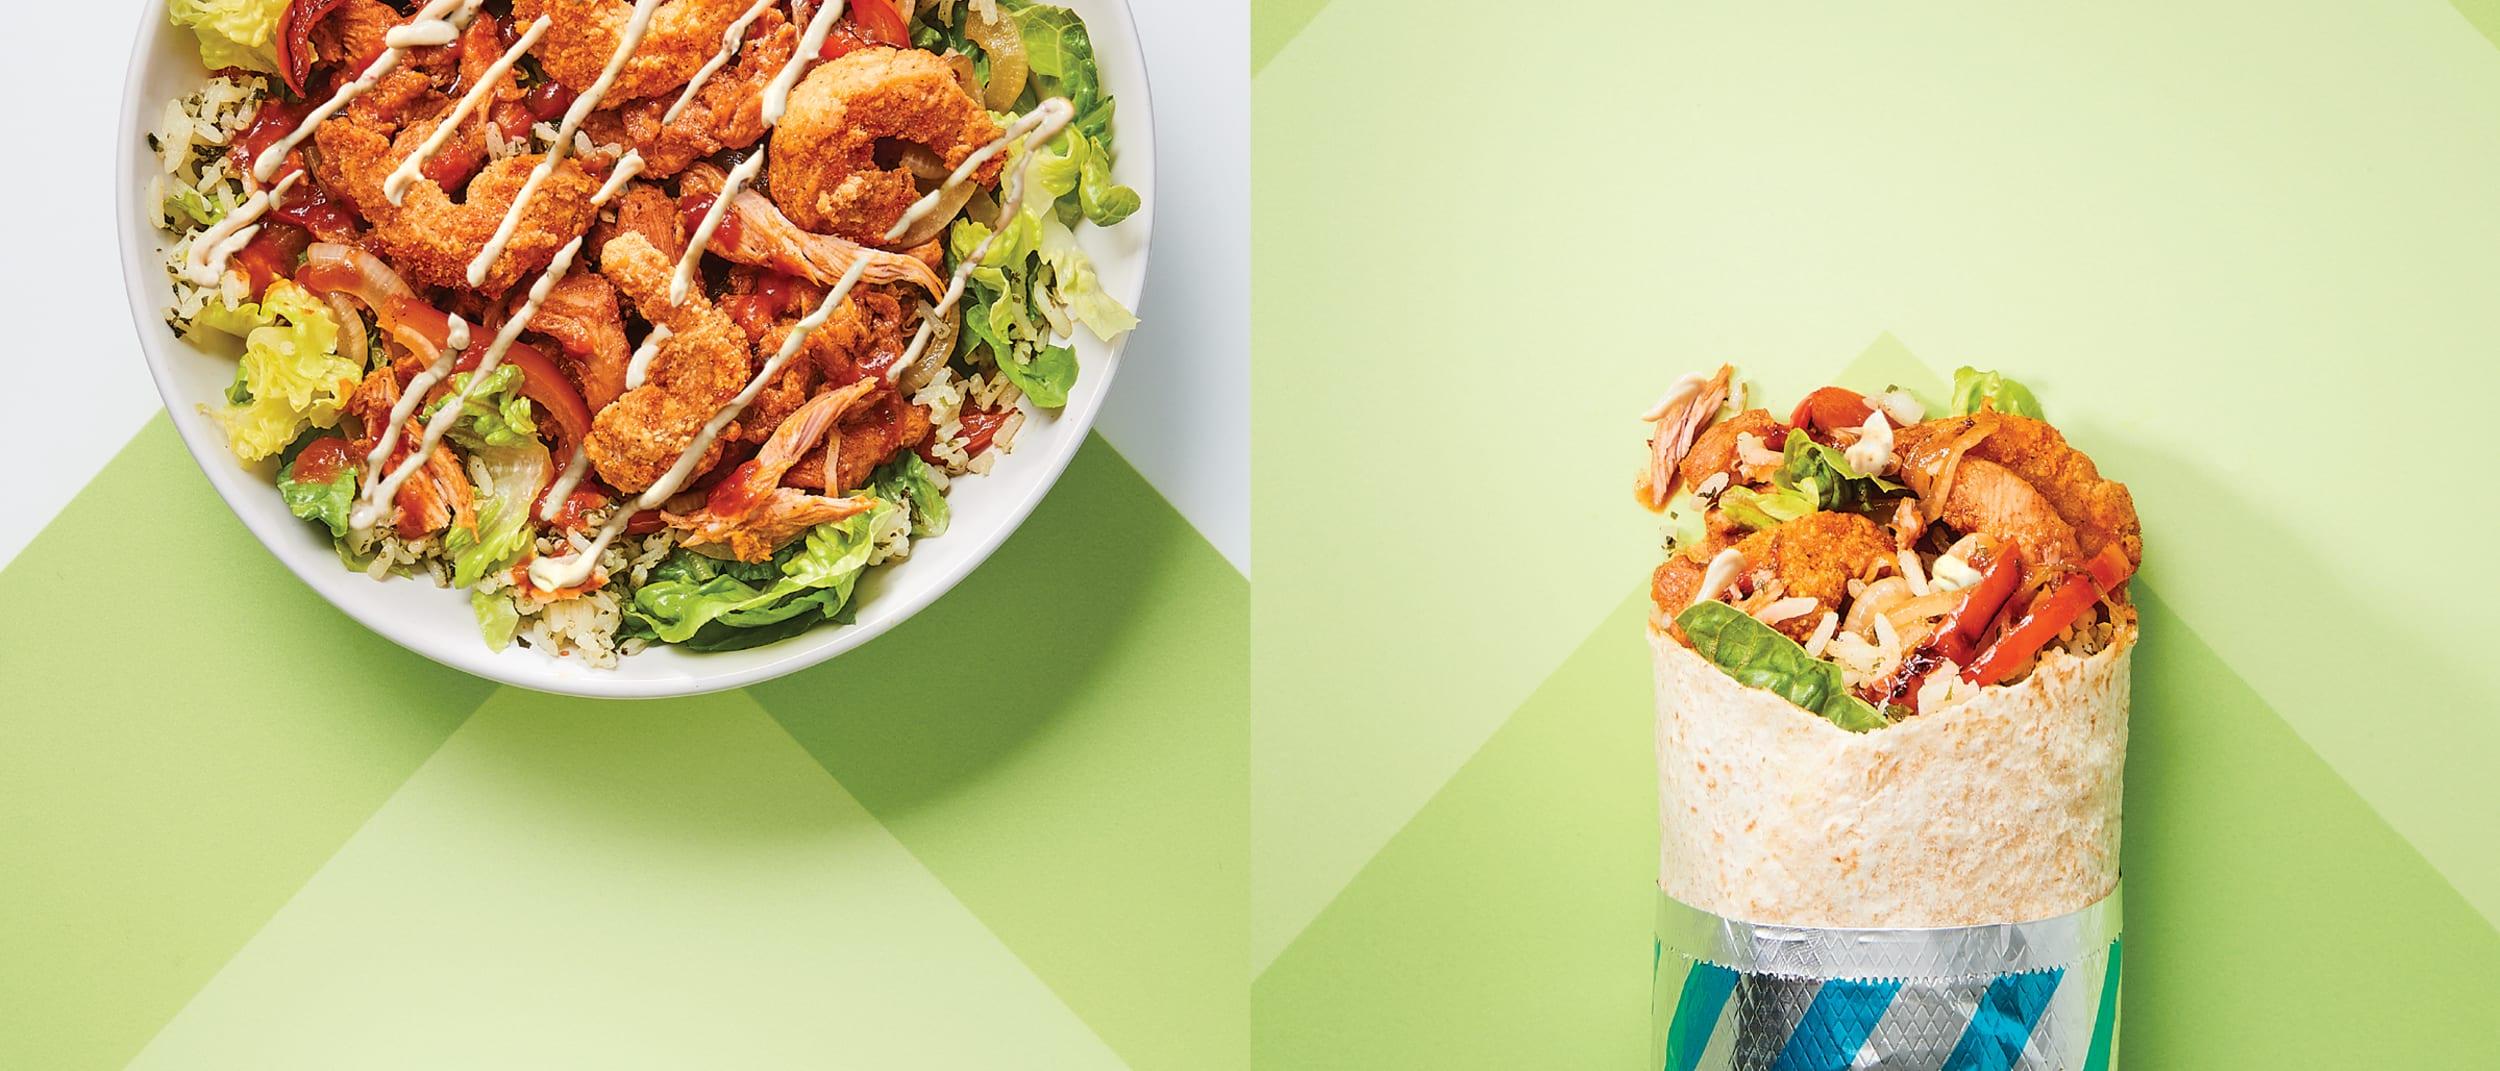 Salsas: Chicken and prawn burrito or bowl